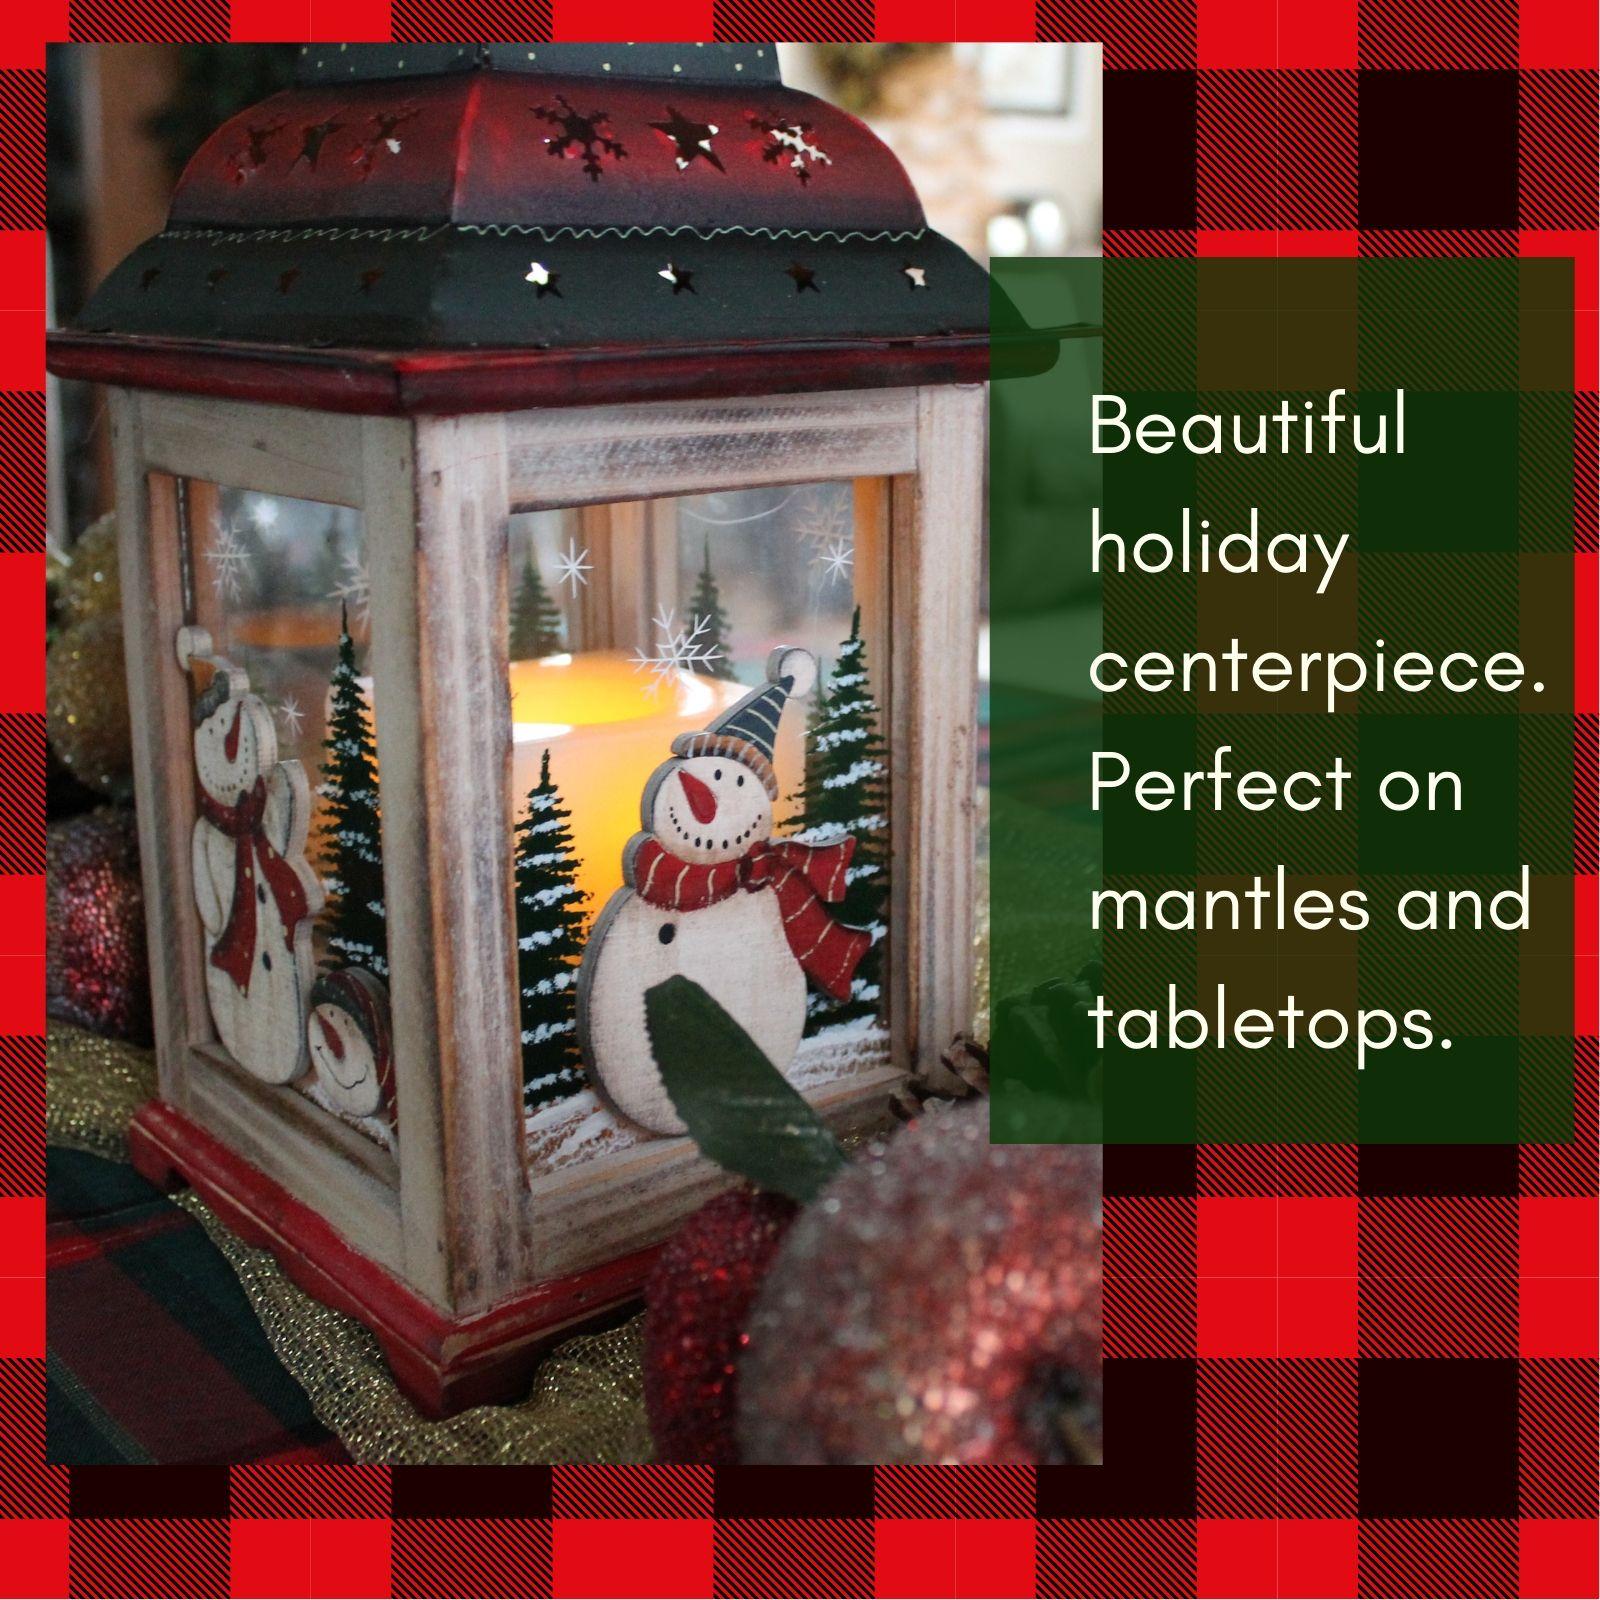 Christmas Snowman Lantern Holiday Table Centerpieces Lanterns Decor Decorative Holiday